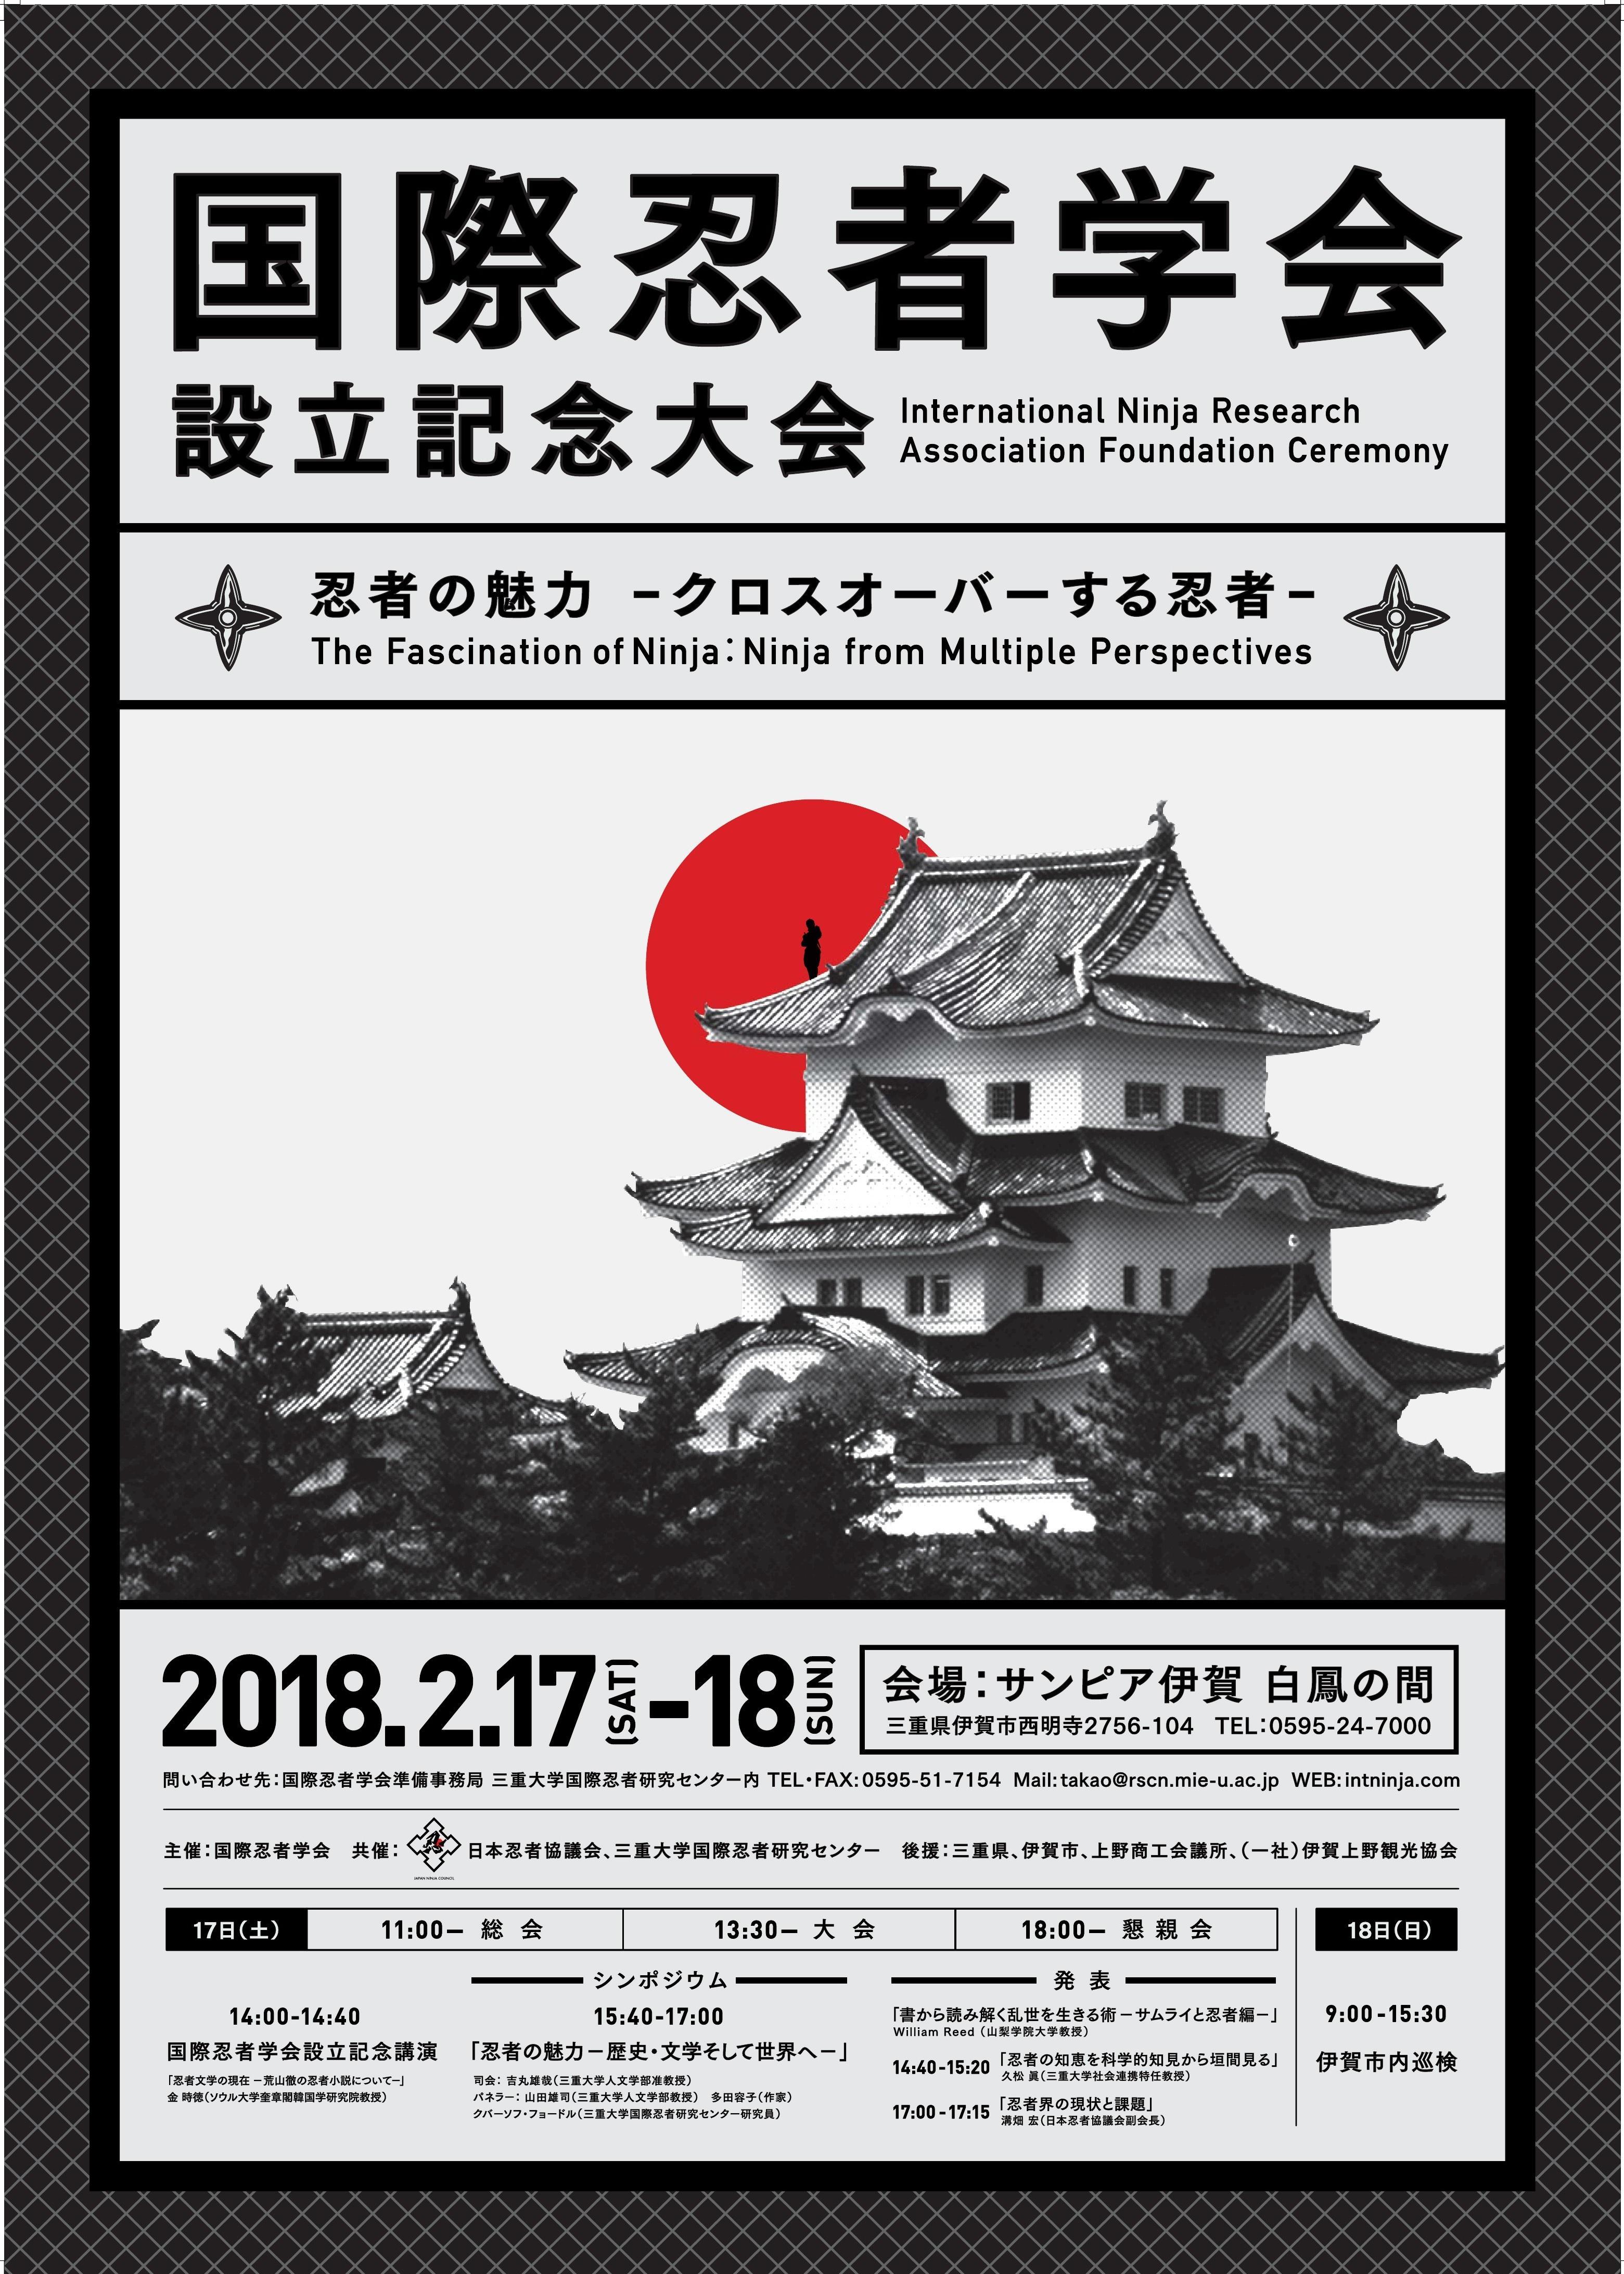 国際忍者学会ポスター.jpg